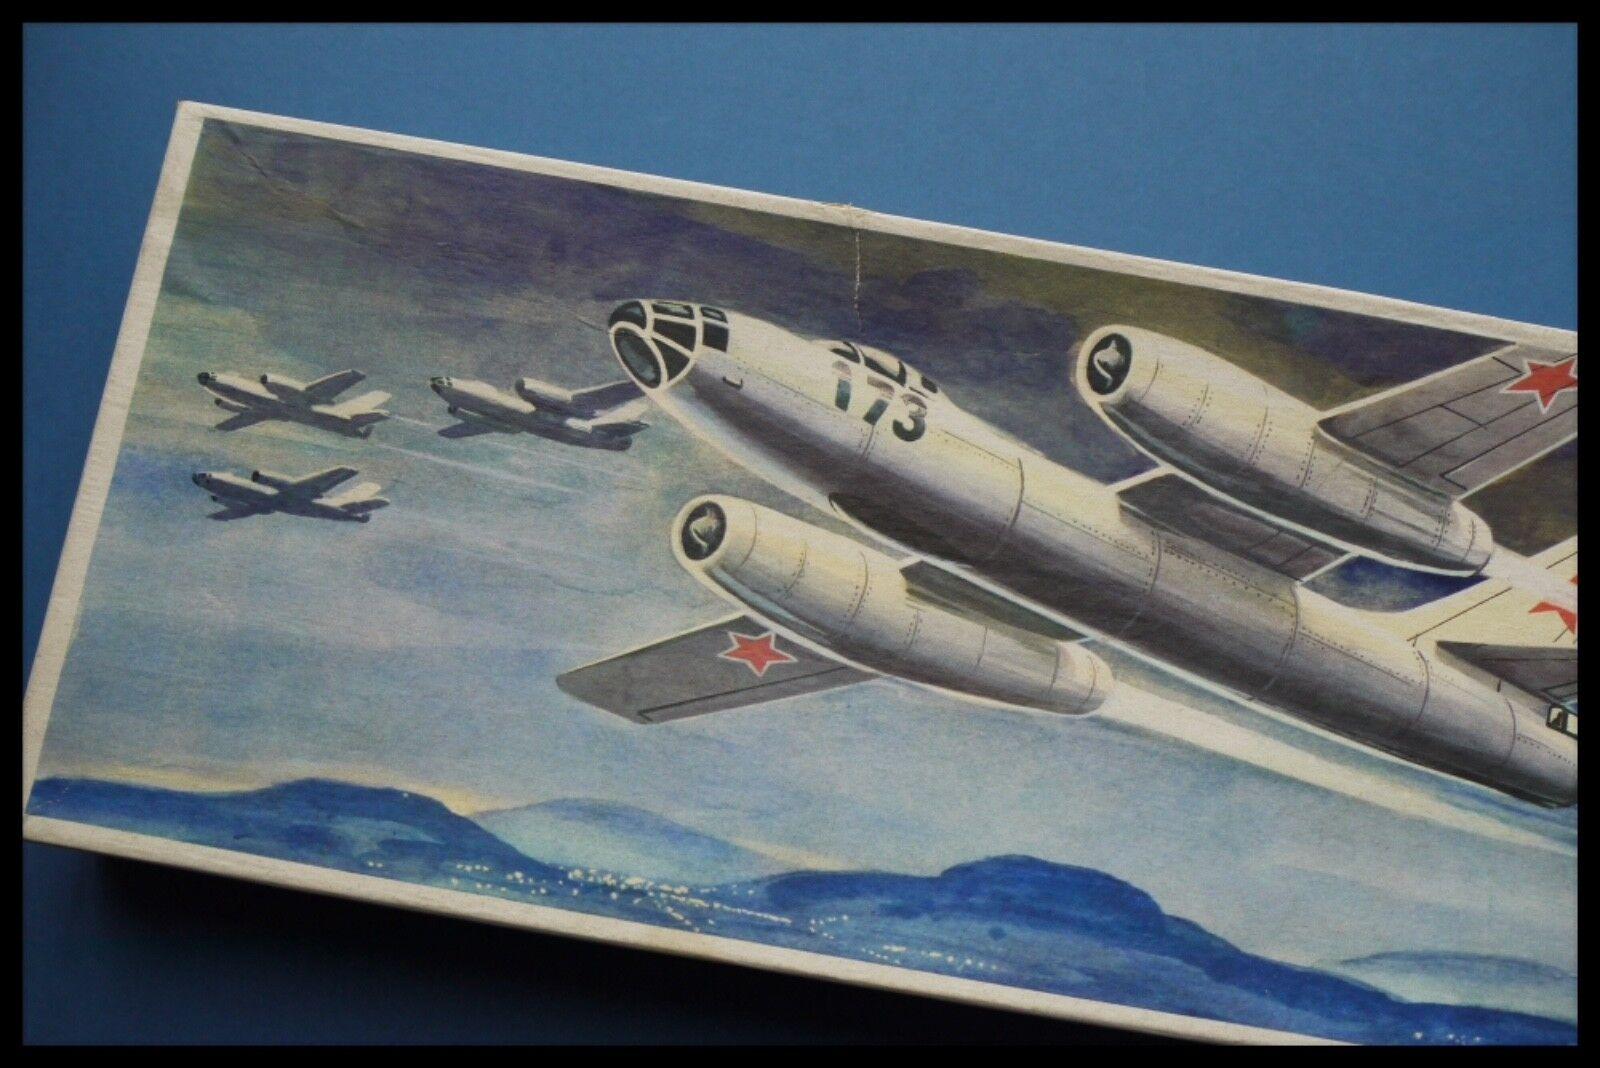 VEB PLASTICART IL-28 1 100 Scale Model Kit Box Made In GDR 1977